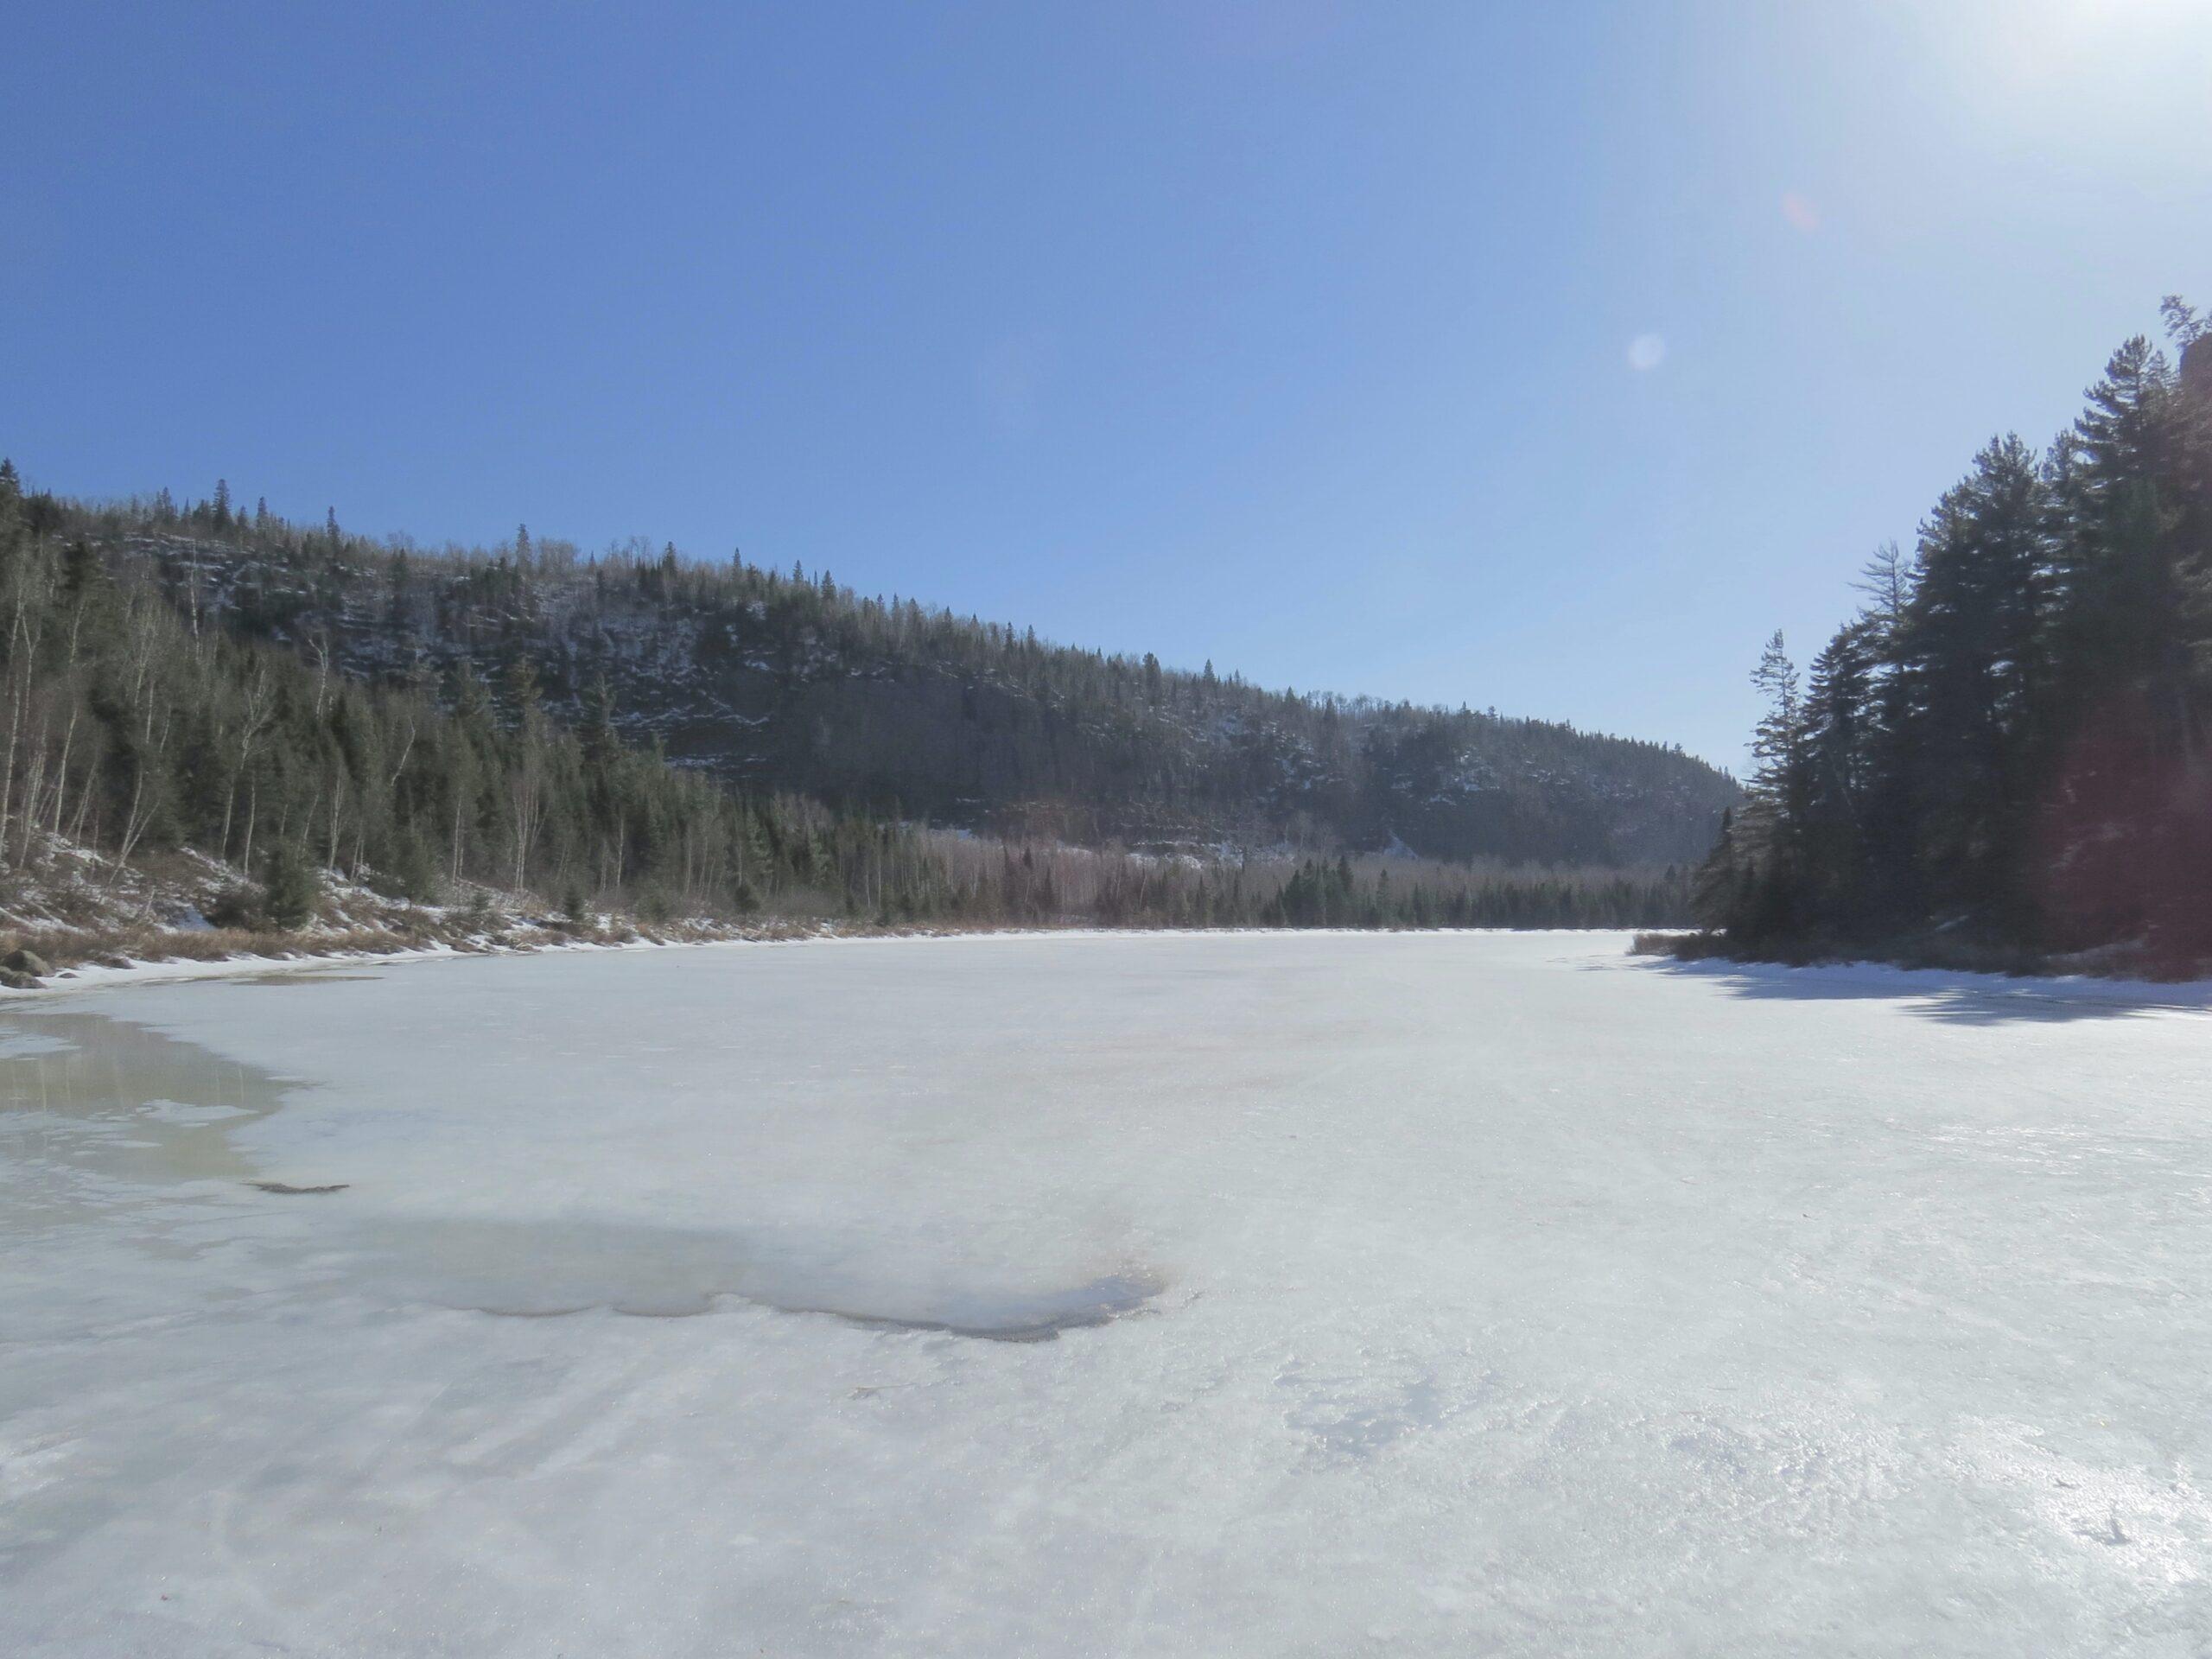 jaime-dantas-Ontario Canadian Wilderness-unsplash